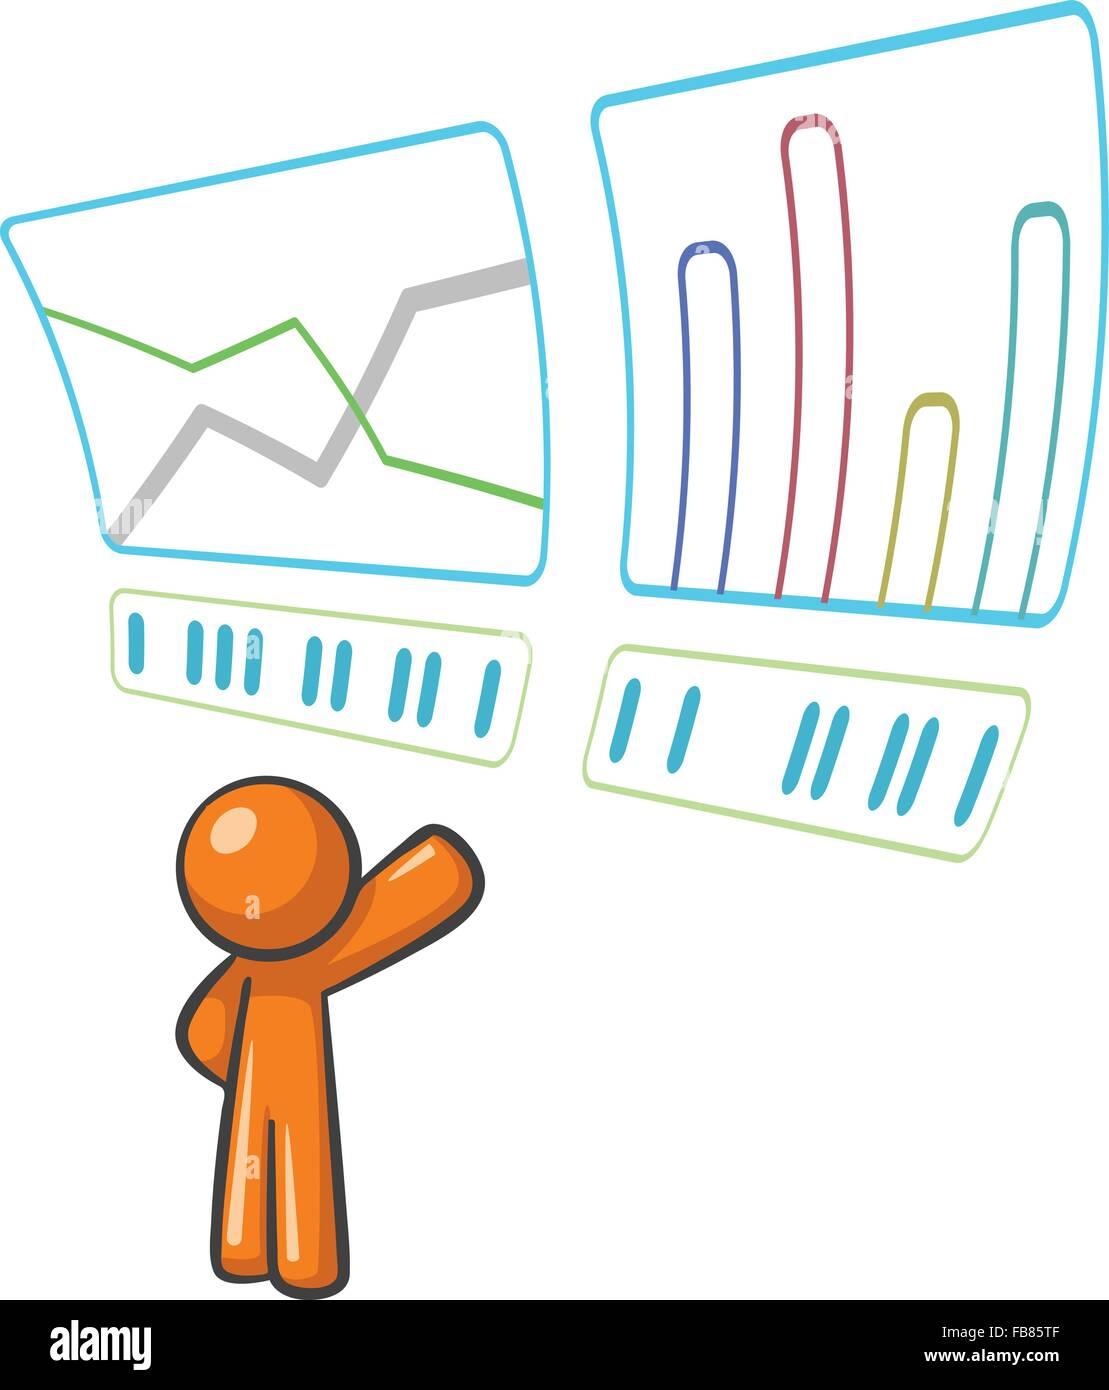 Orange Man tracking data and statistics. - Stock Image